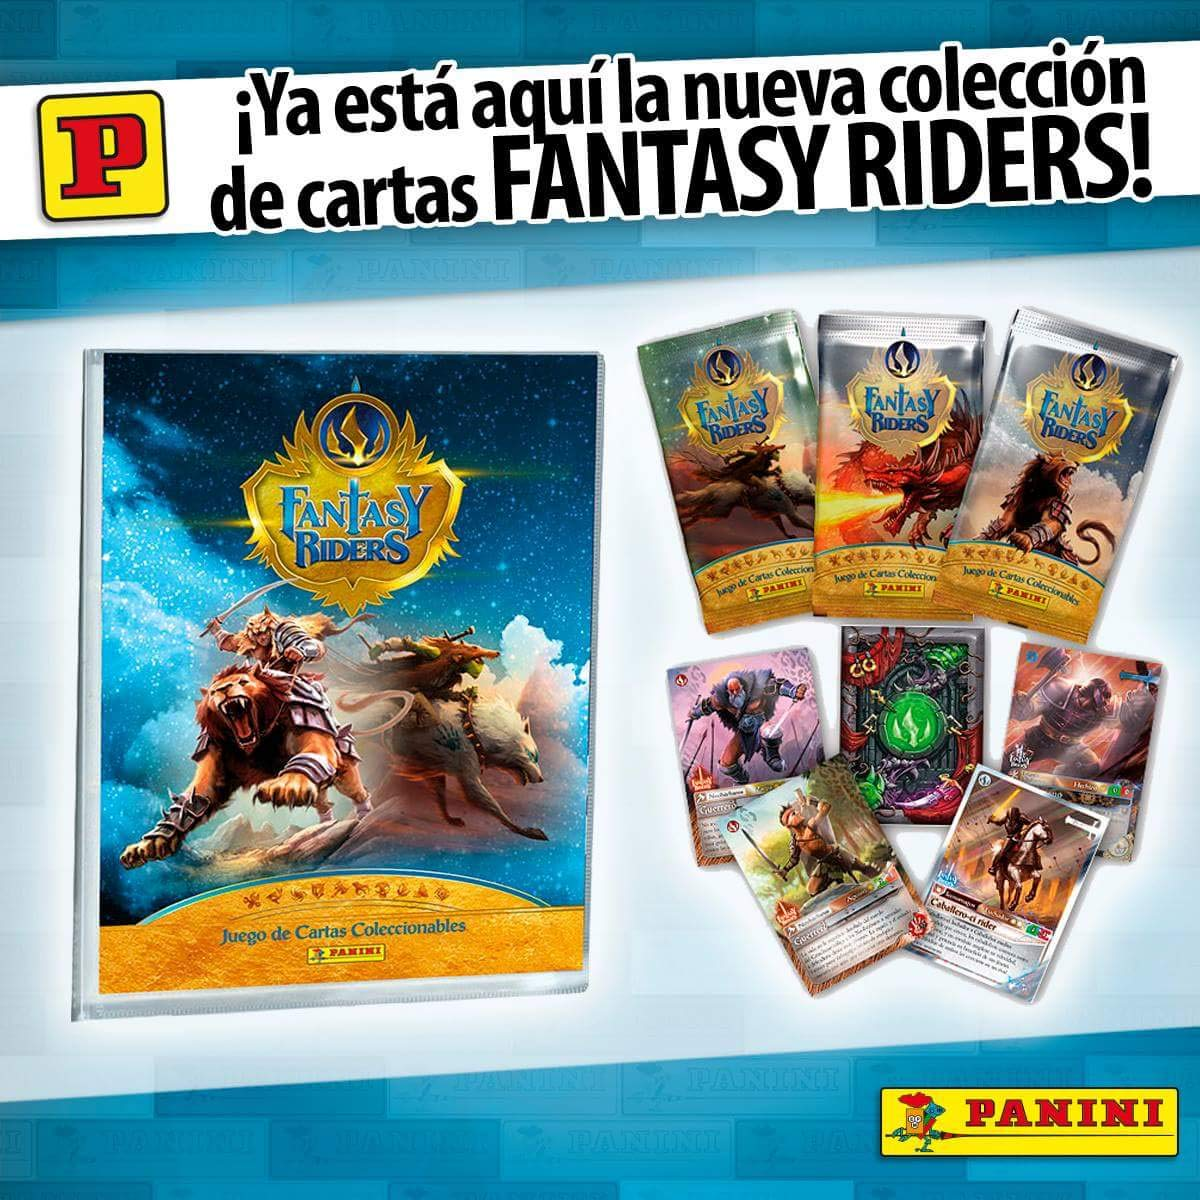 Panini megapack Lanzamiento Fantasy Riders product image